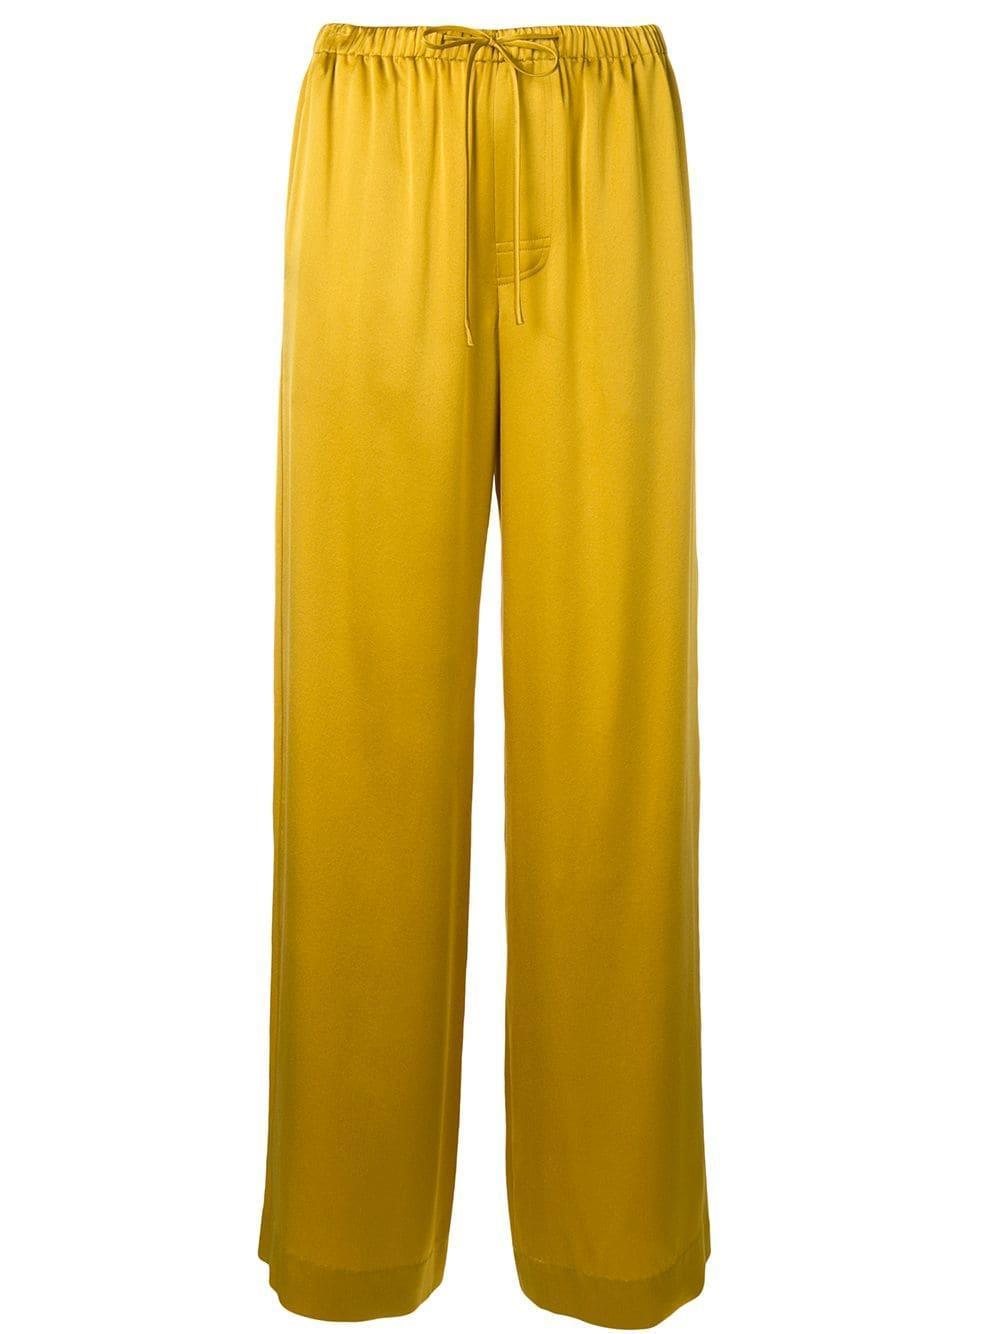 Satin Pajama Pullon Pant